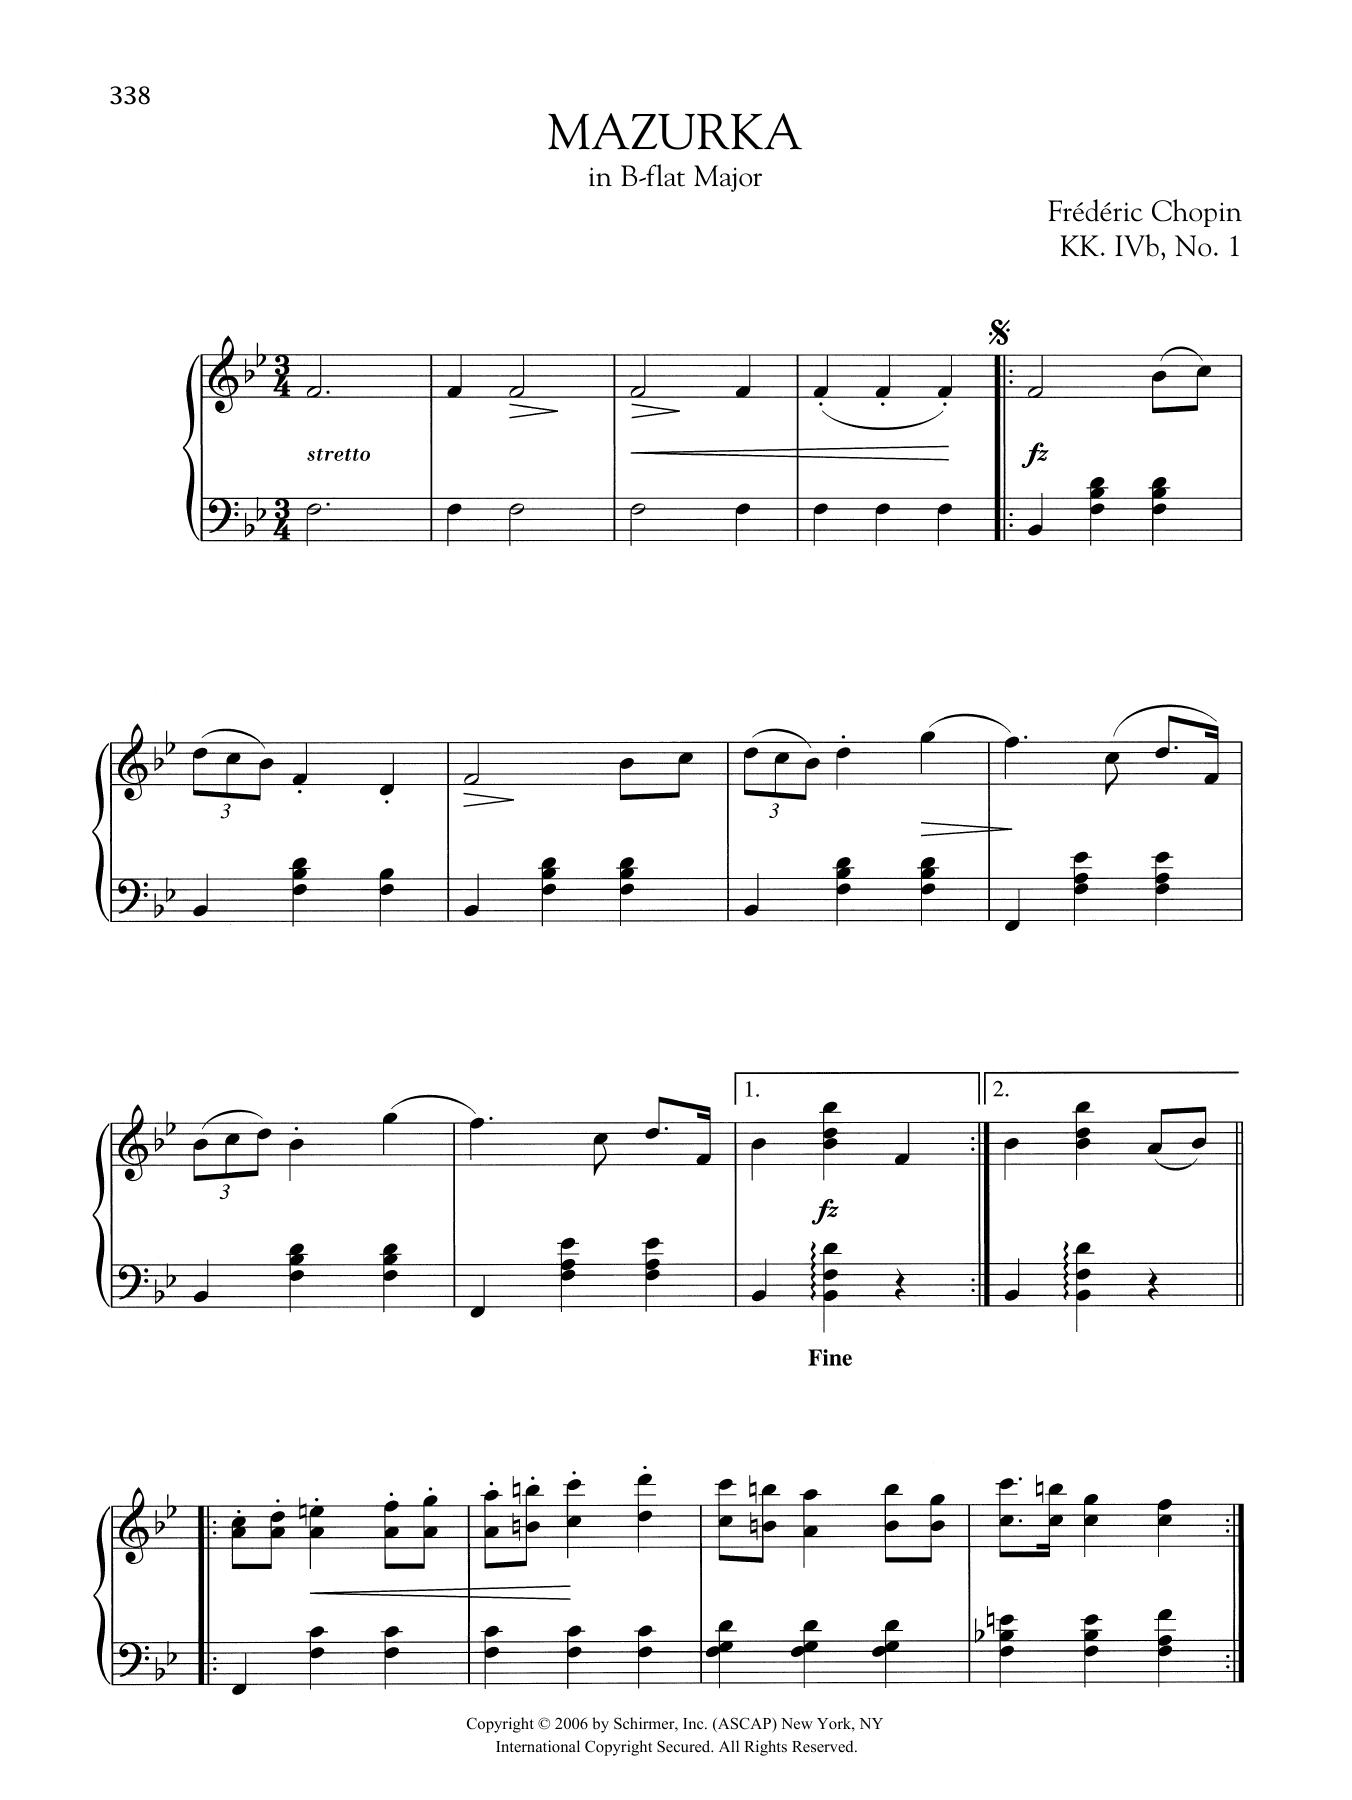 Mazurka in B-flat Major, KK. IVb, No. 1 Sheet Music